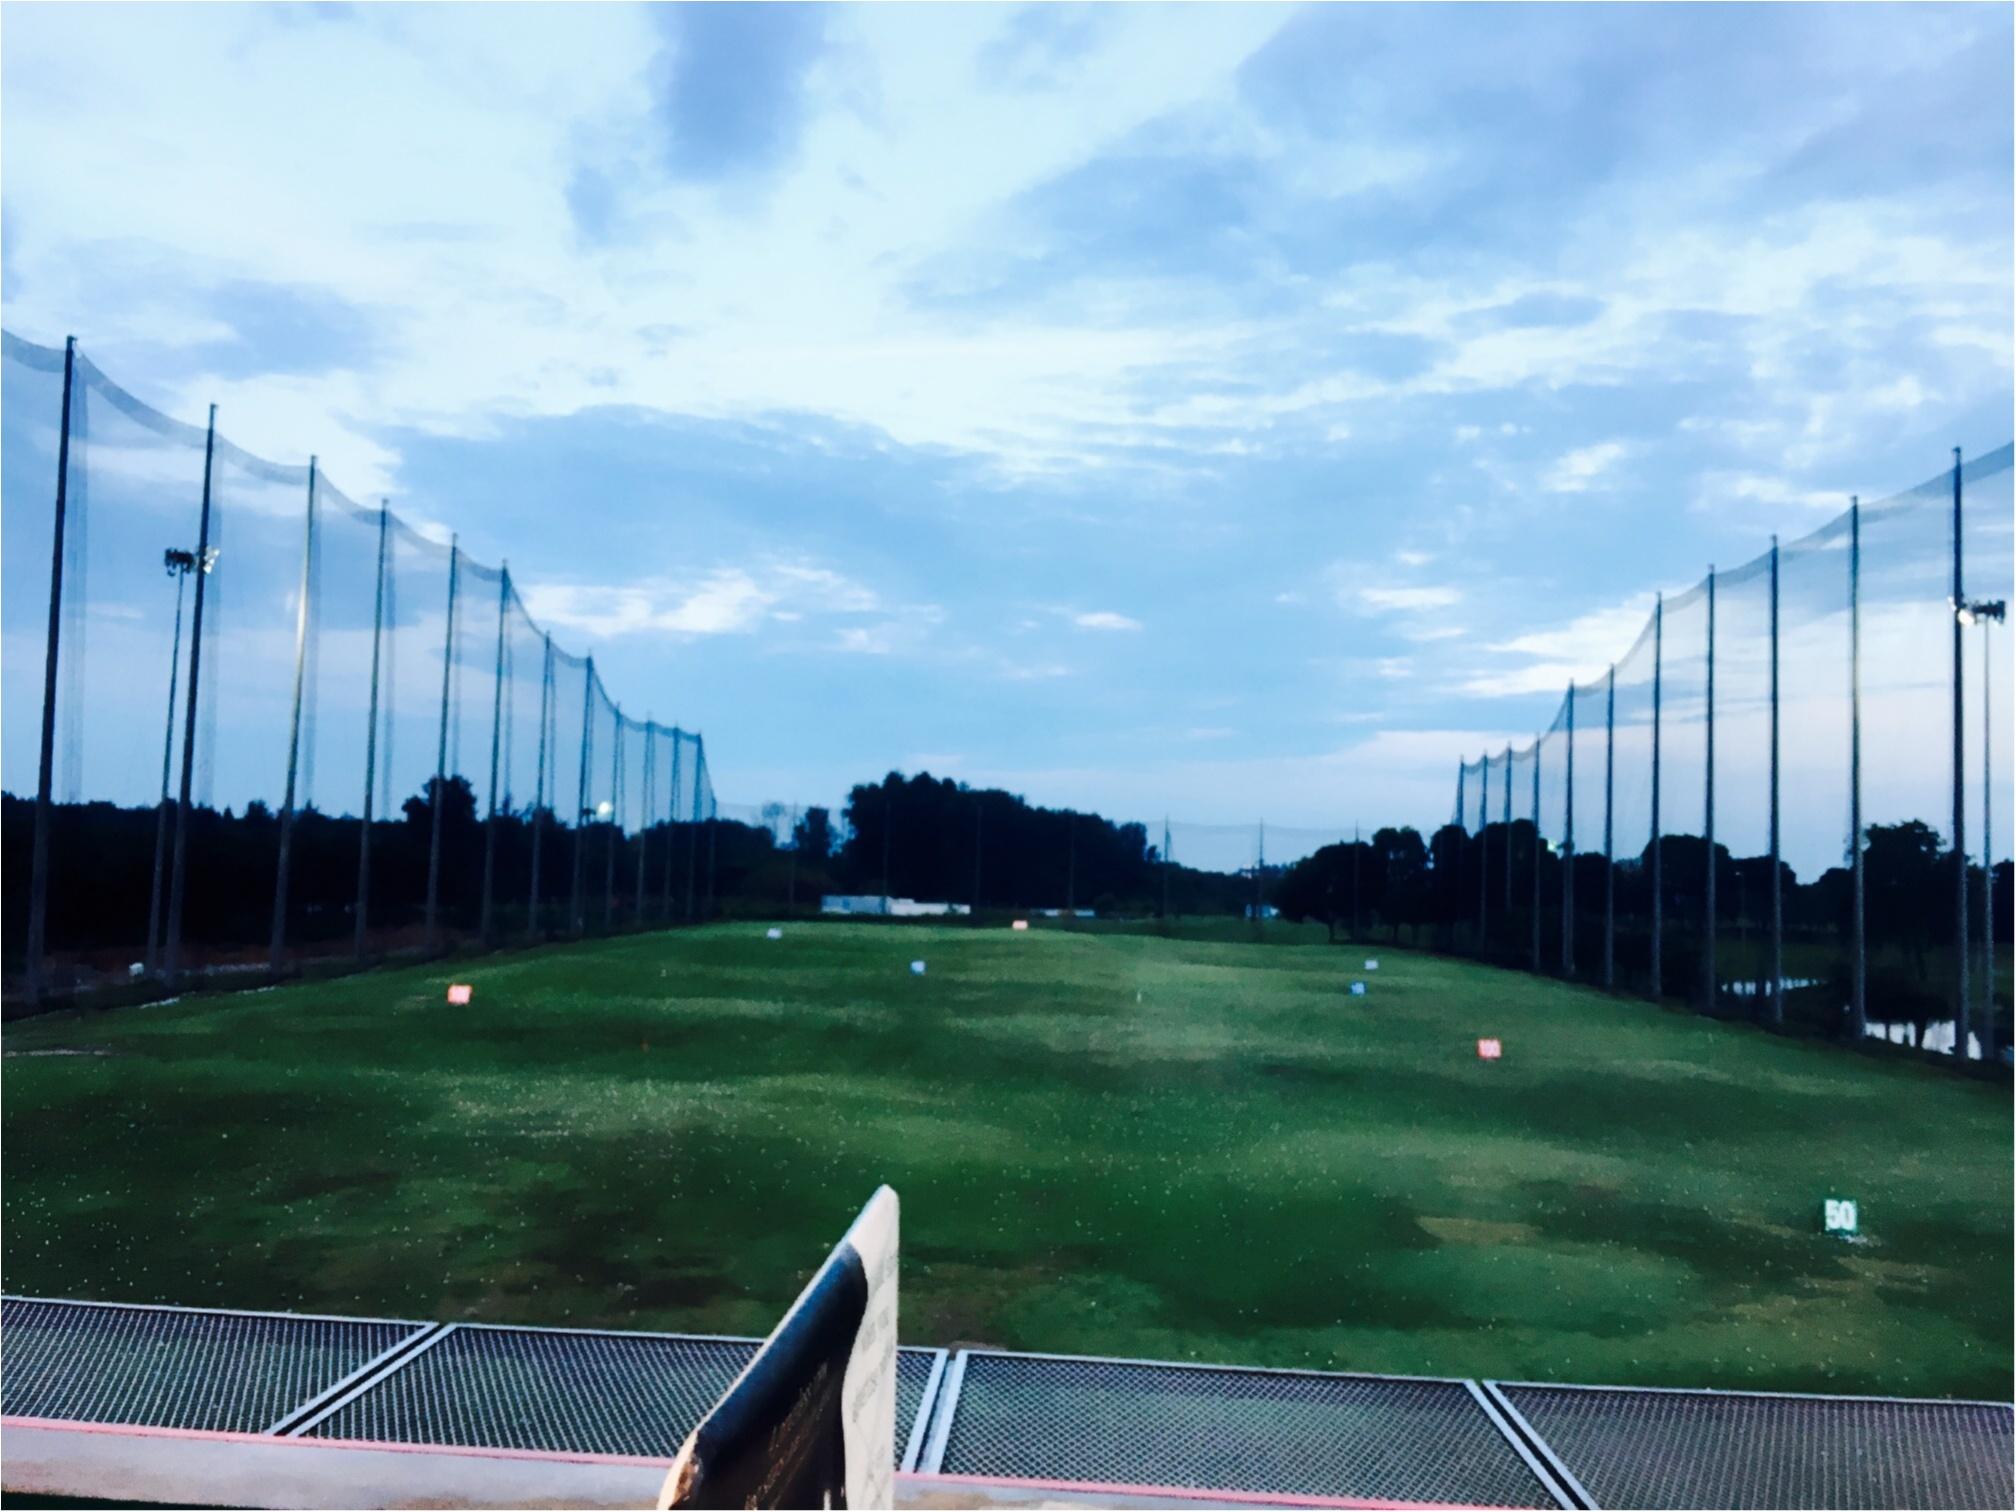 golf!ゴルフ!ゴルフ〜♡♡♡マリーナベイゴルフコースがお気に入りの人。_3